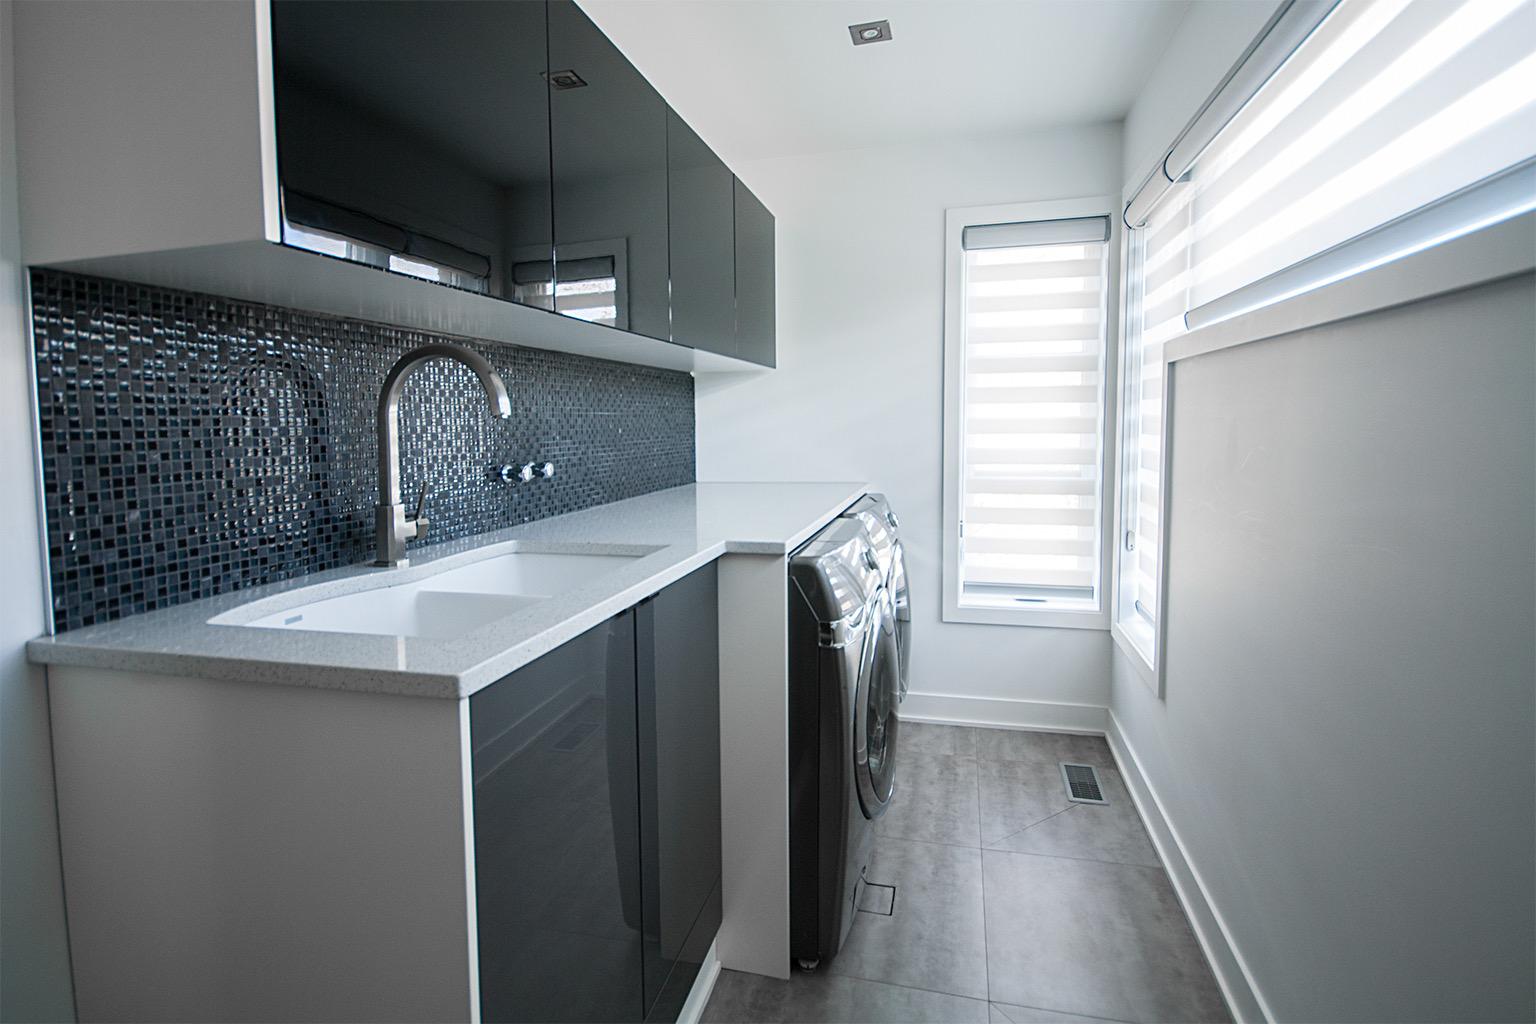 21_Laundry-Room.JPG